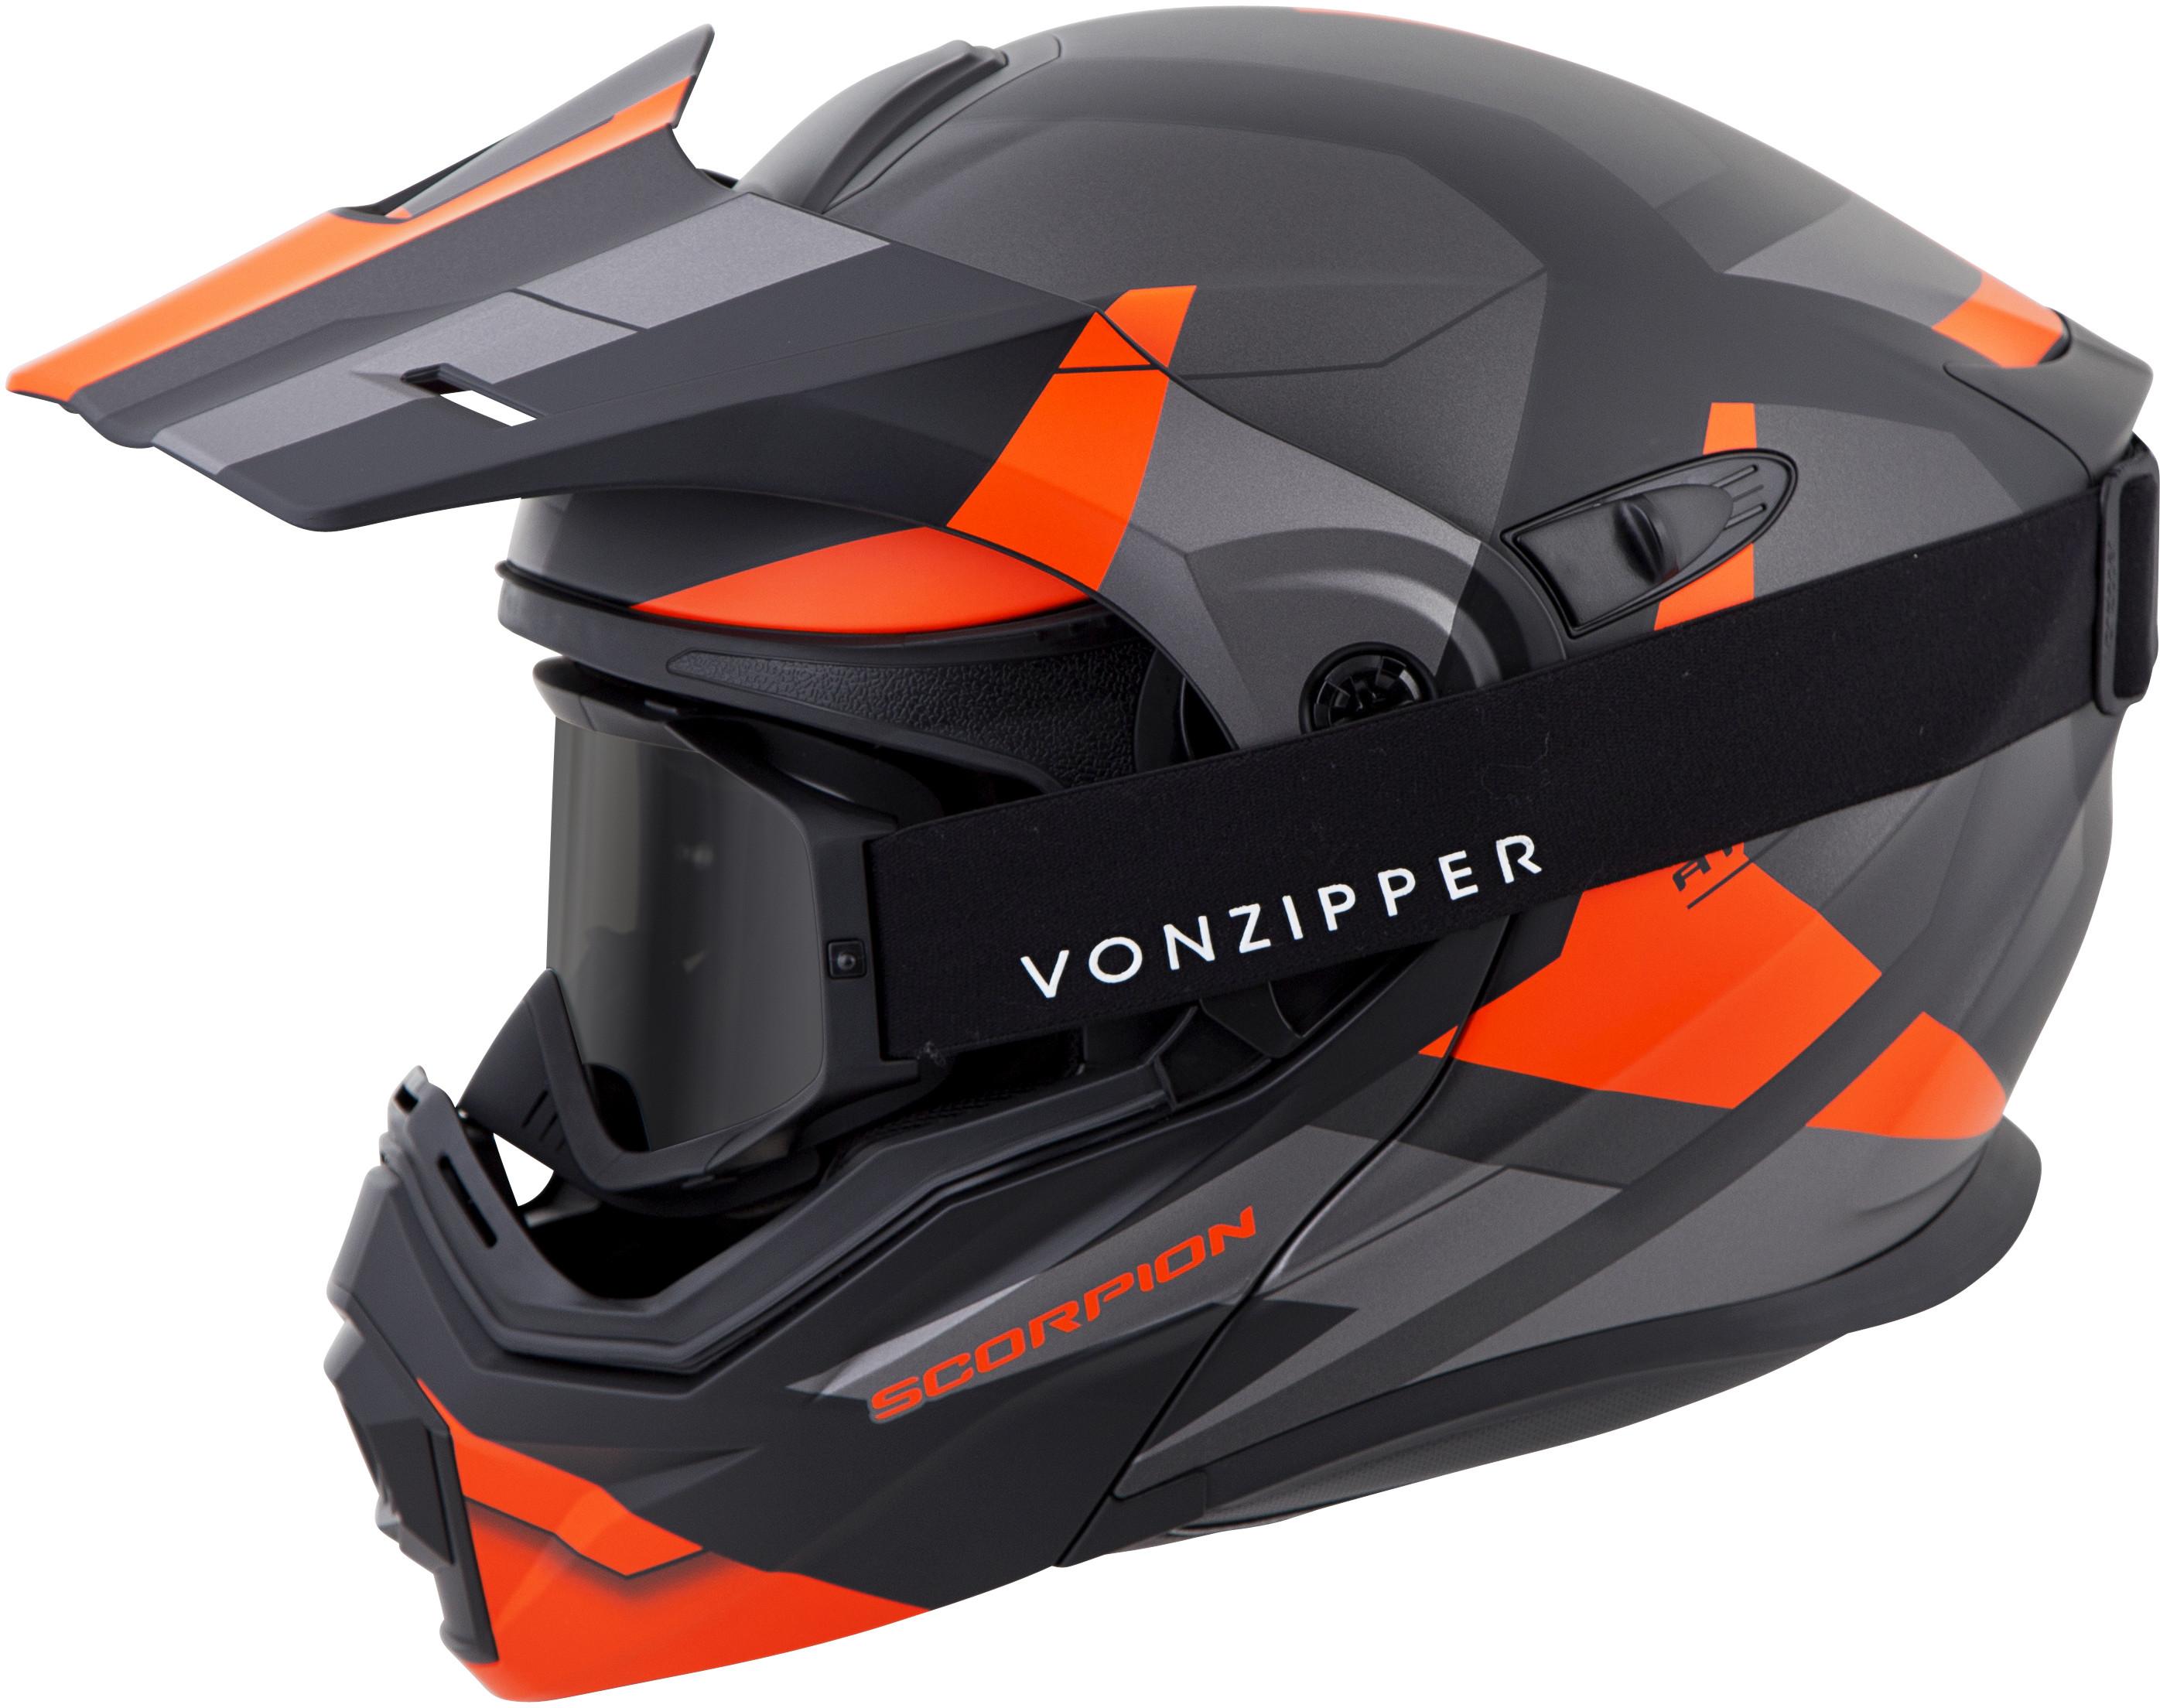 for-Scorpion-Helmet-EXO-AT950-Neocon-Snow-Helmet-with-Dual-Lens-Shield miniature 18